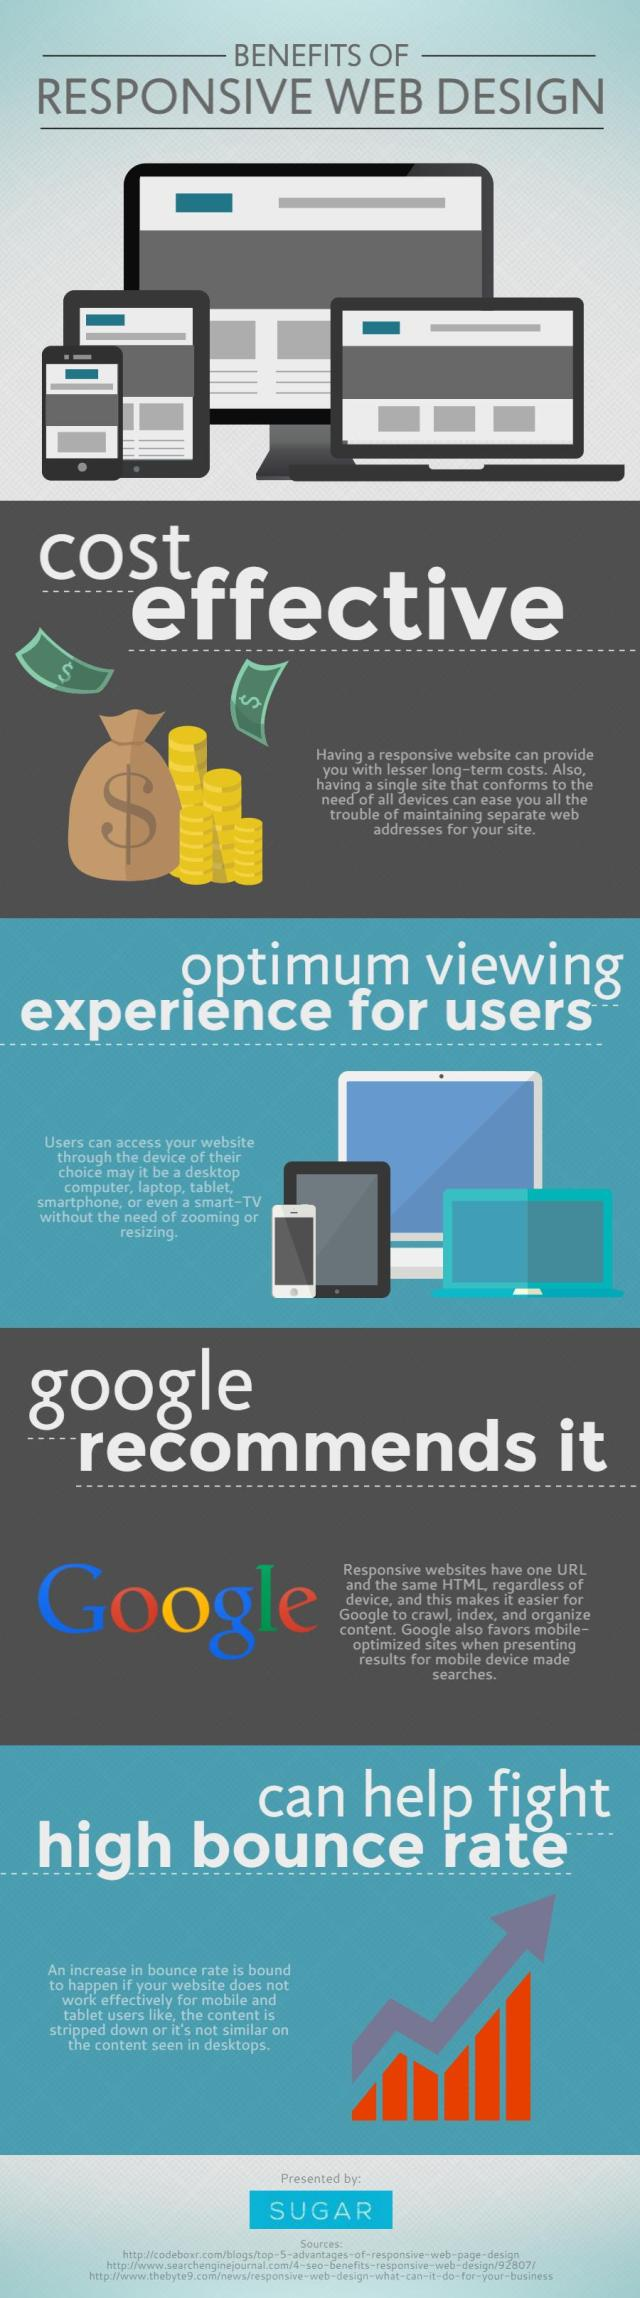 benefits-of-responsive-web-design_5546da8b937b9